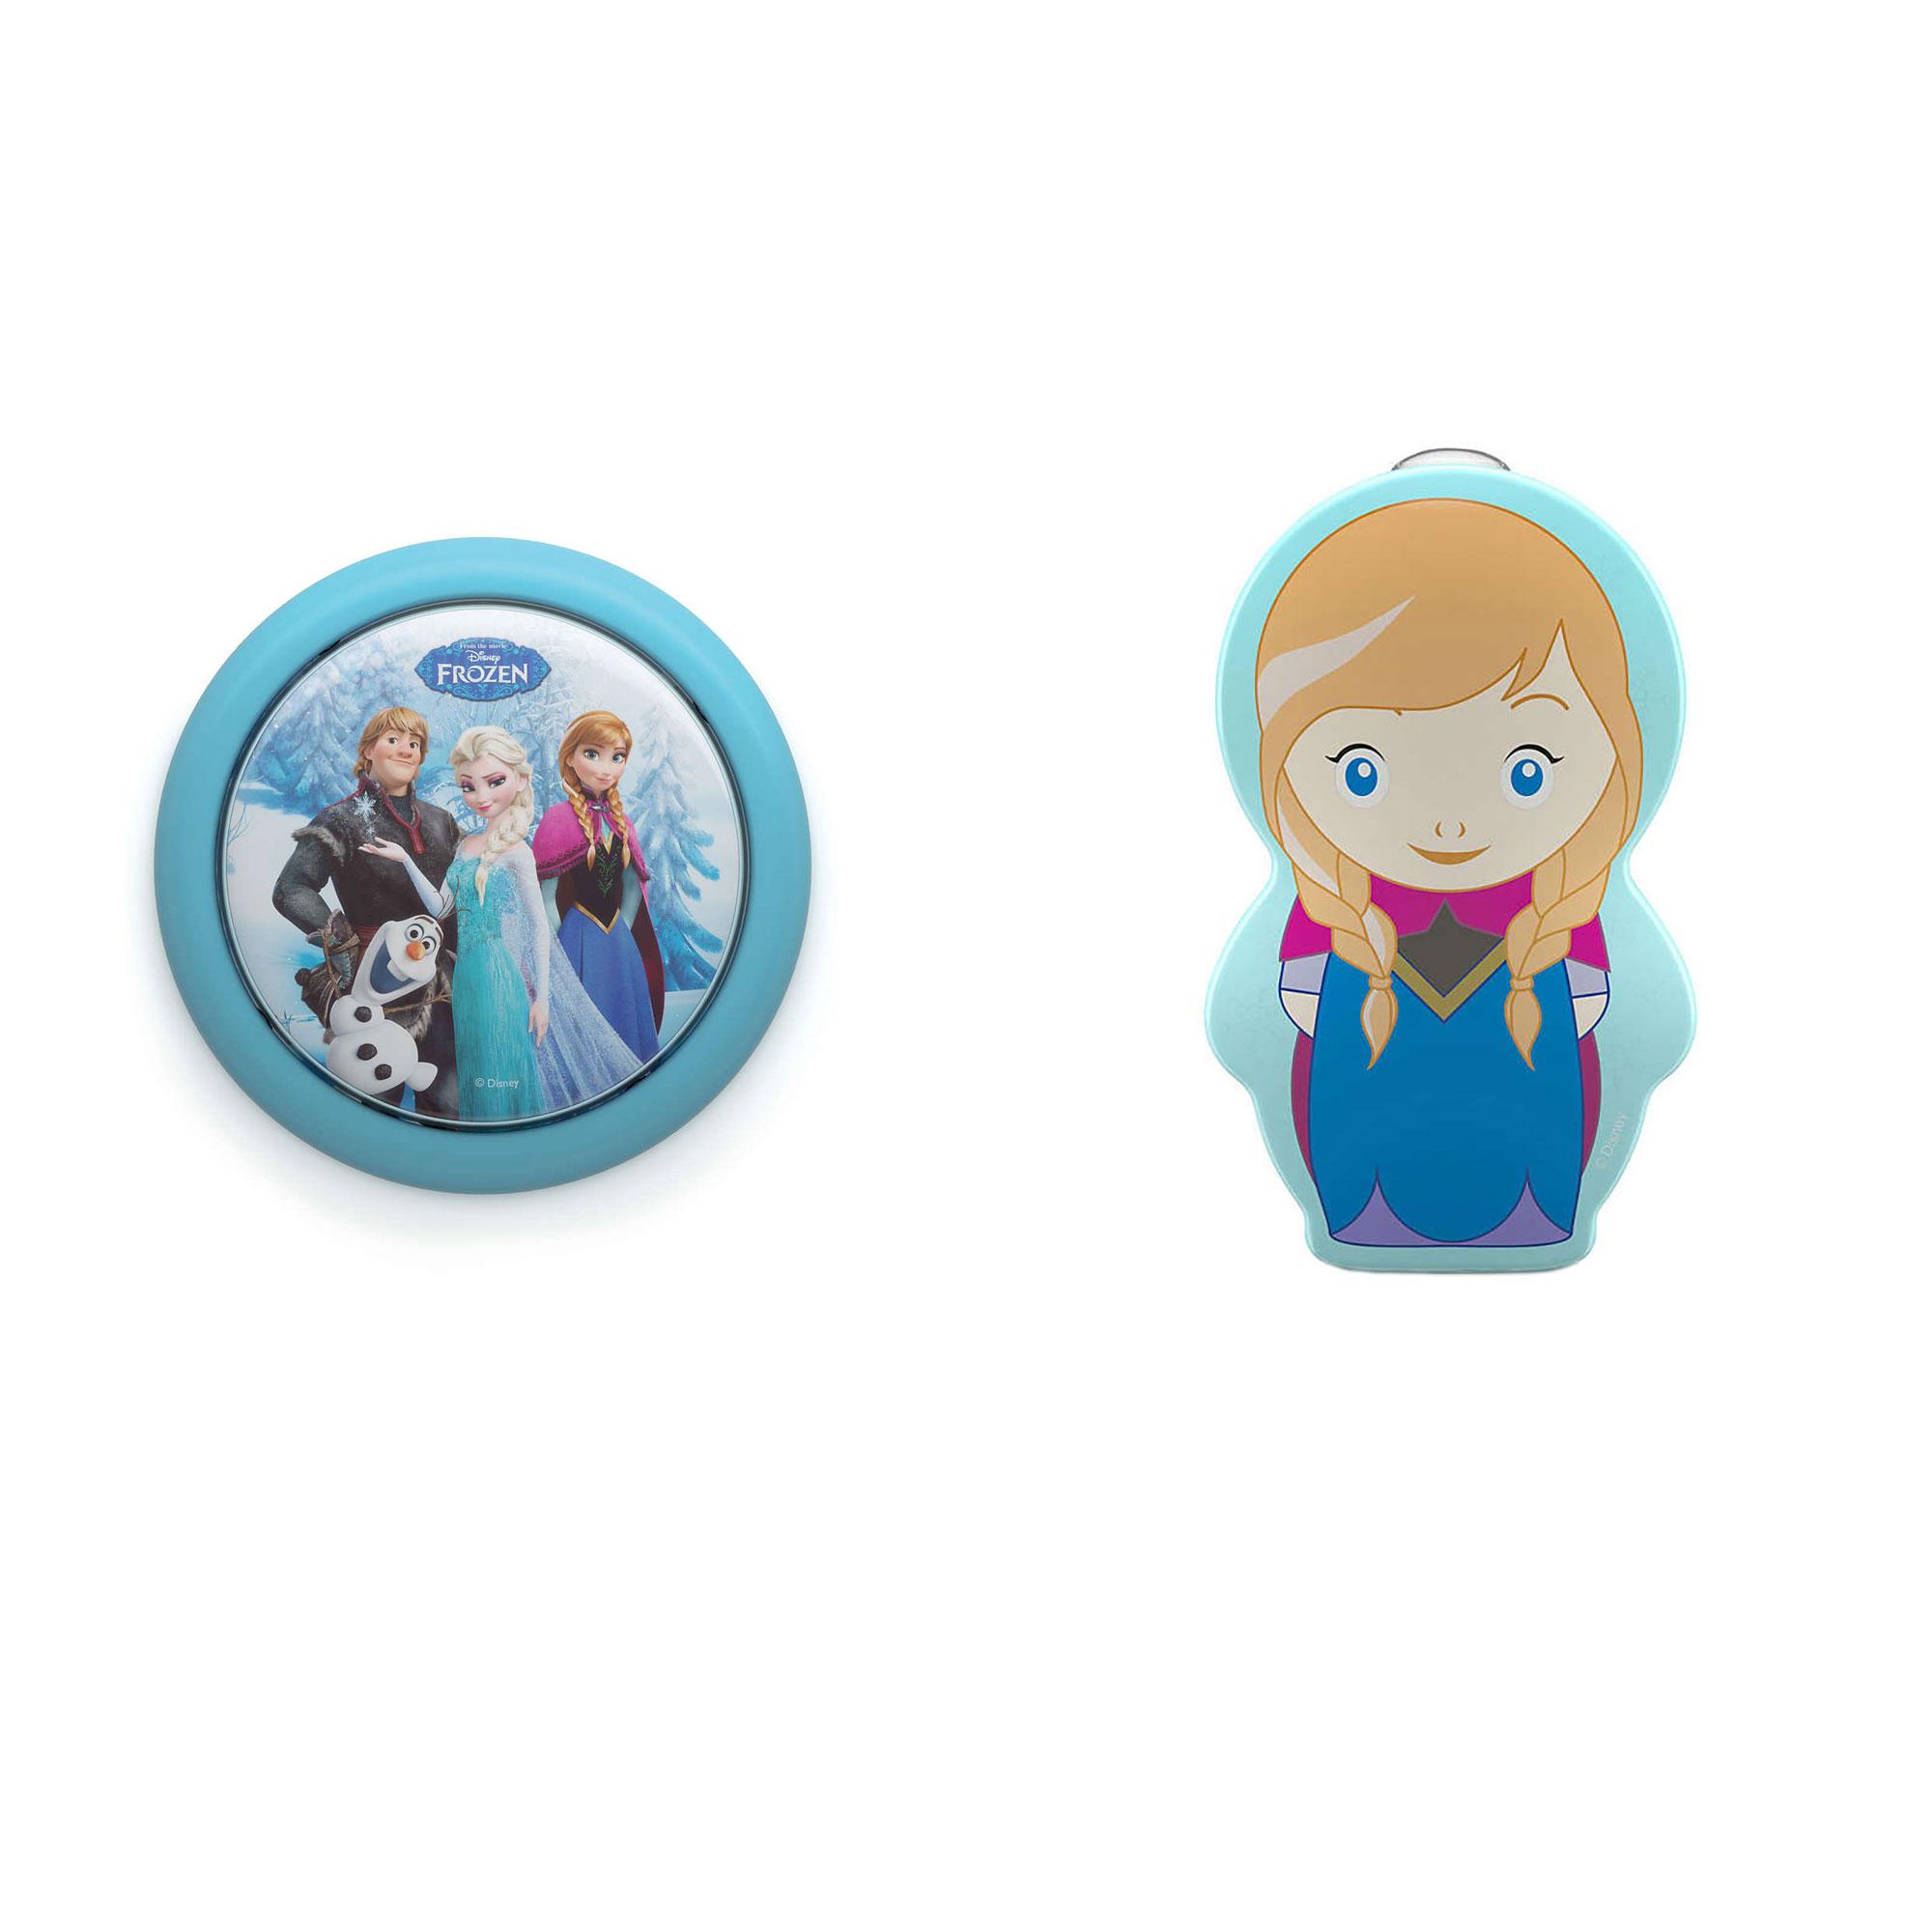 PLC-7192408U0 + PLC-7176737U0 Philips Disney Frozen Touch Night Light w/ Philips Kids Frozen Anna Light